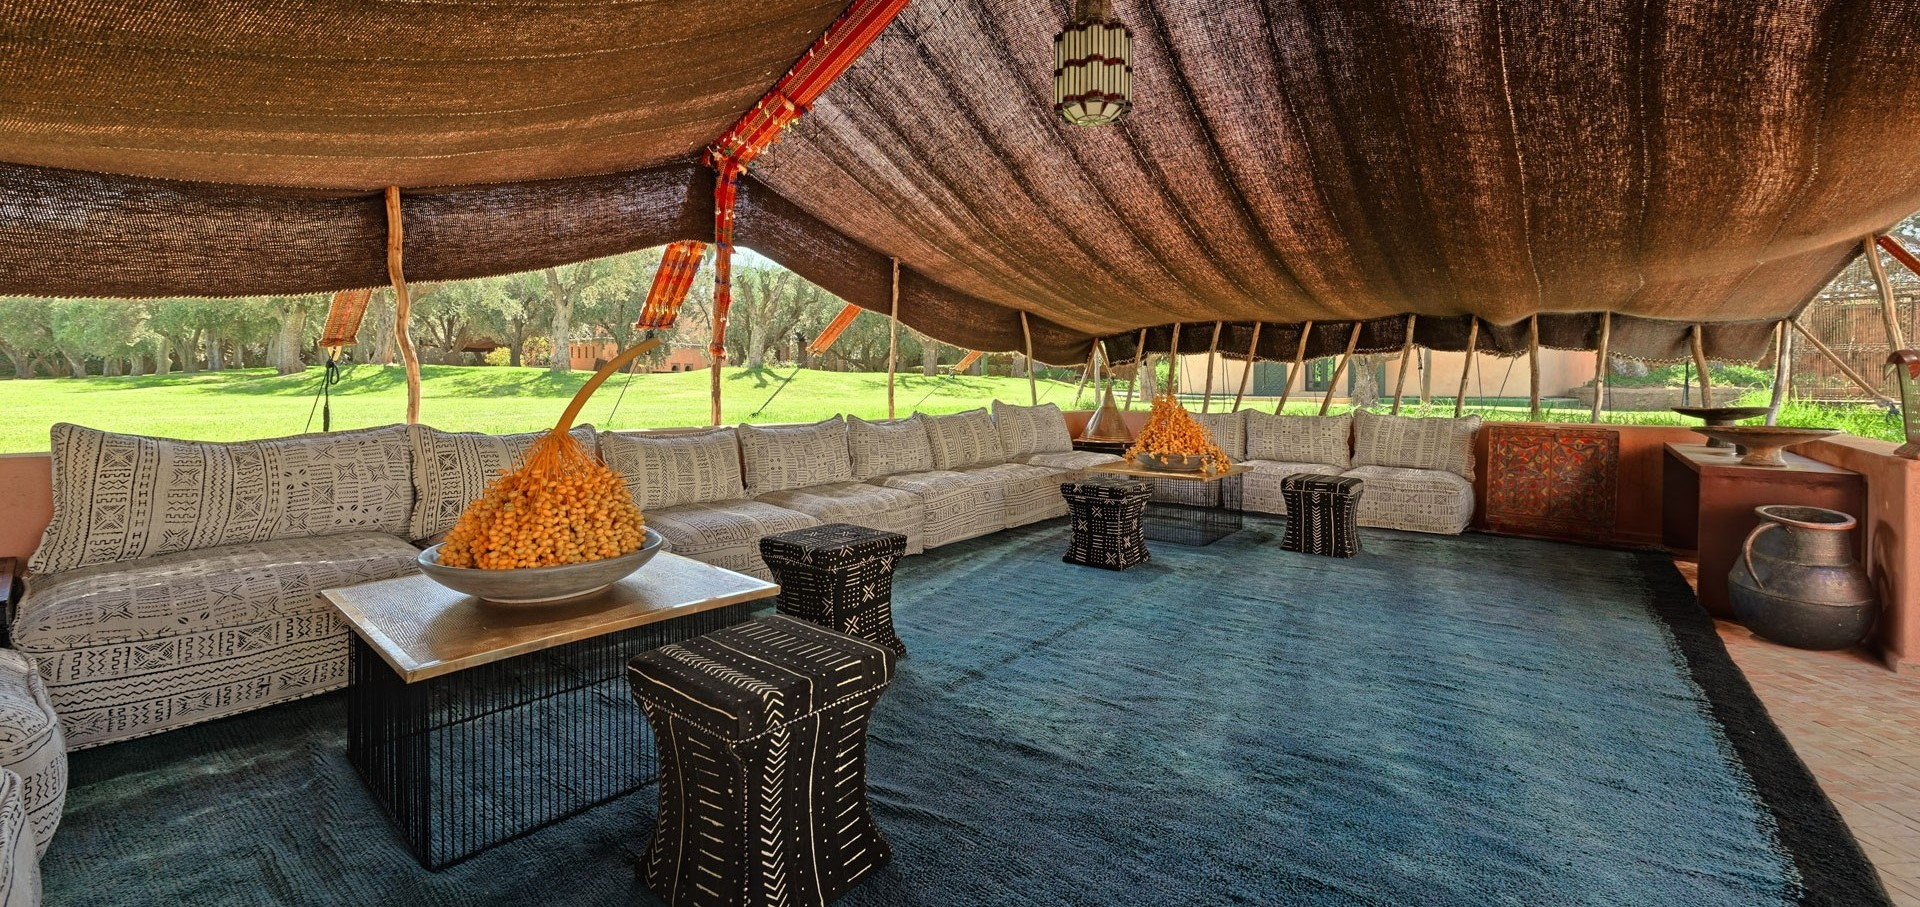 villa-azzaytouna-berber-tent-interior